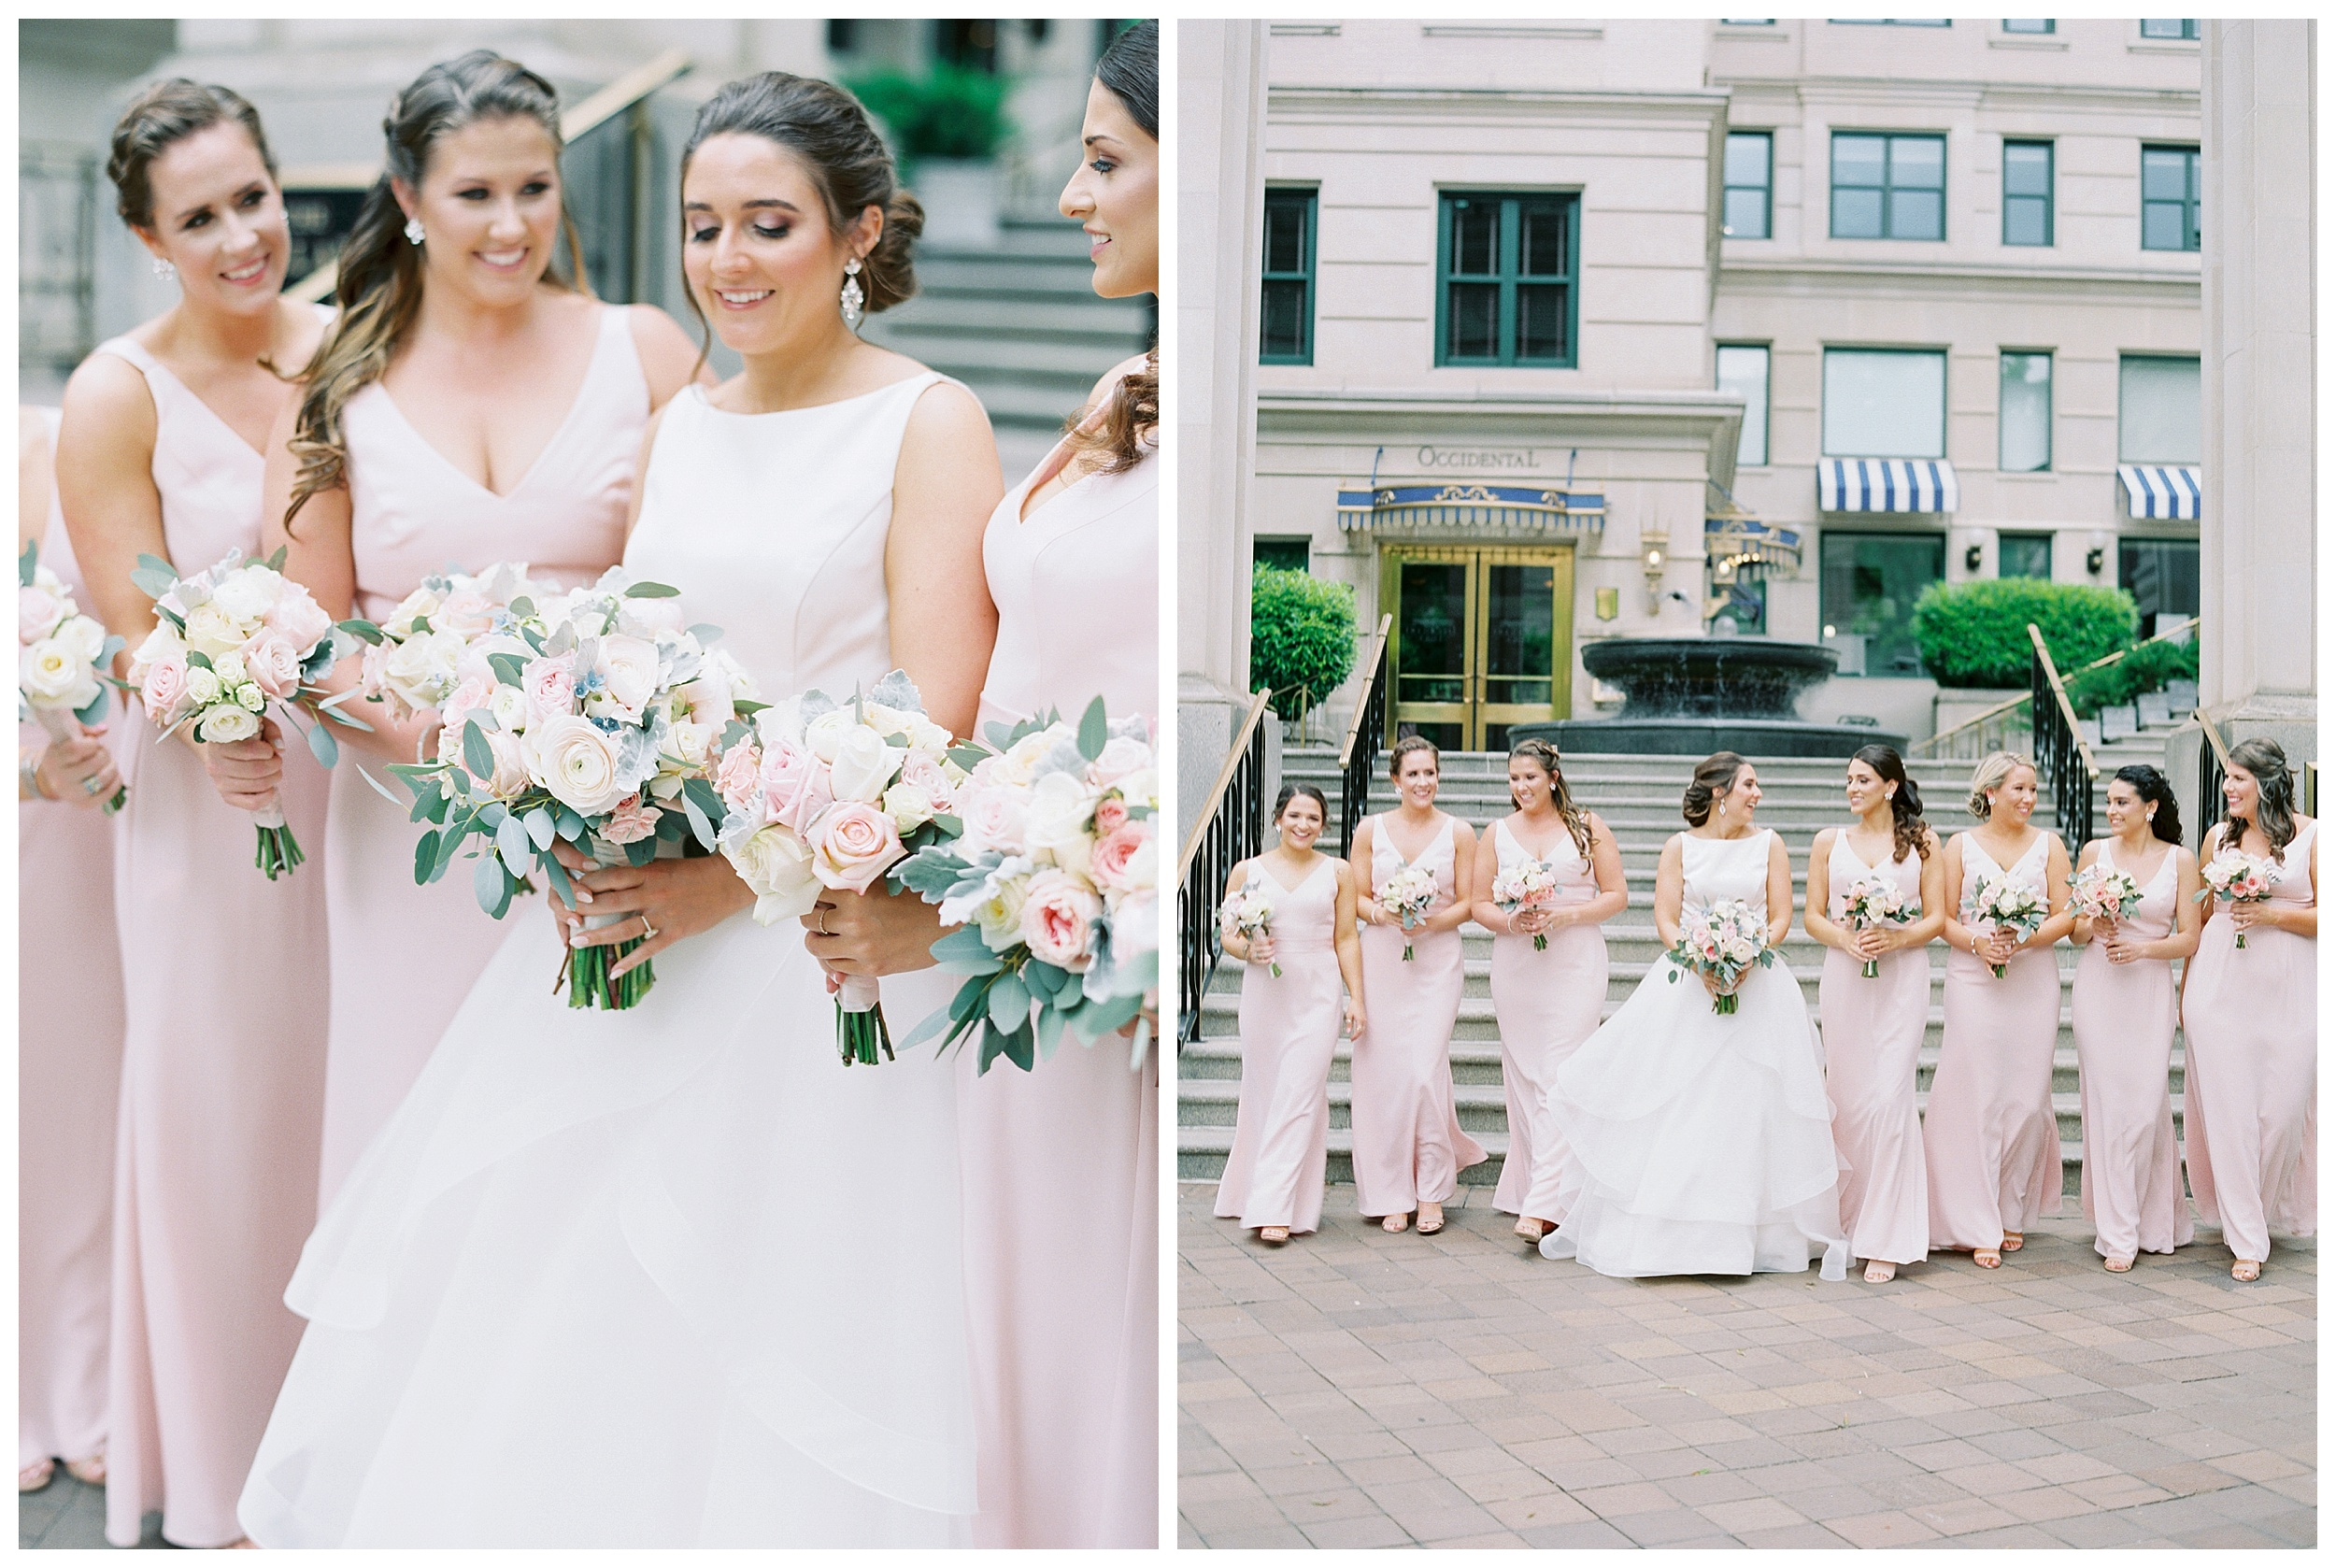 DAR Constitution Hall Wedding Wedding | Daughters of the American Revolution Wedding | District of Columbia Film Wedding Photographer Kir Tuben_0030.jpg